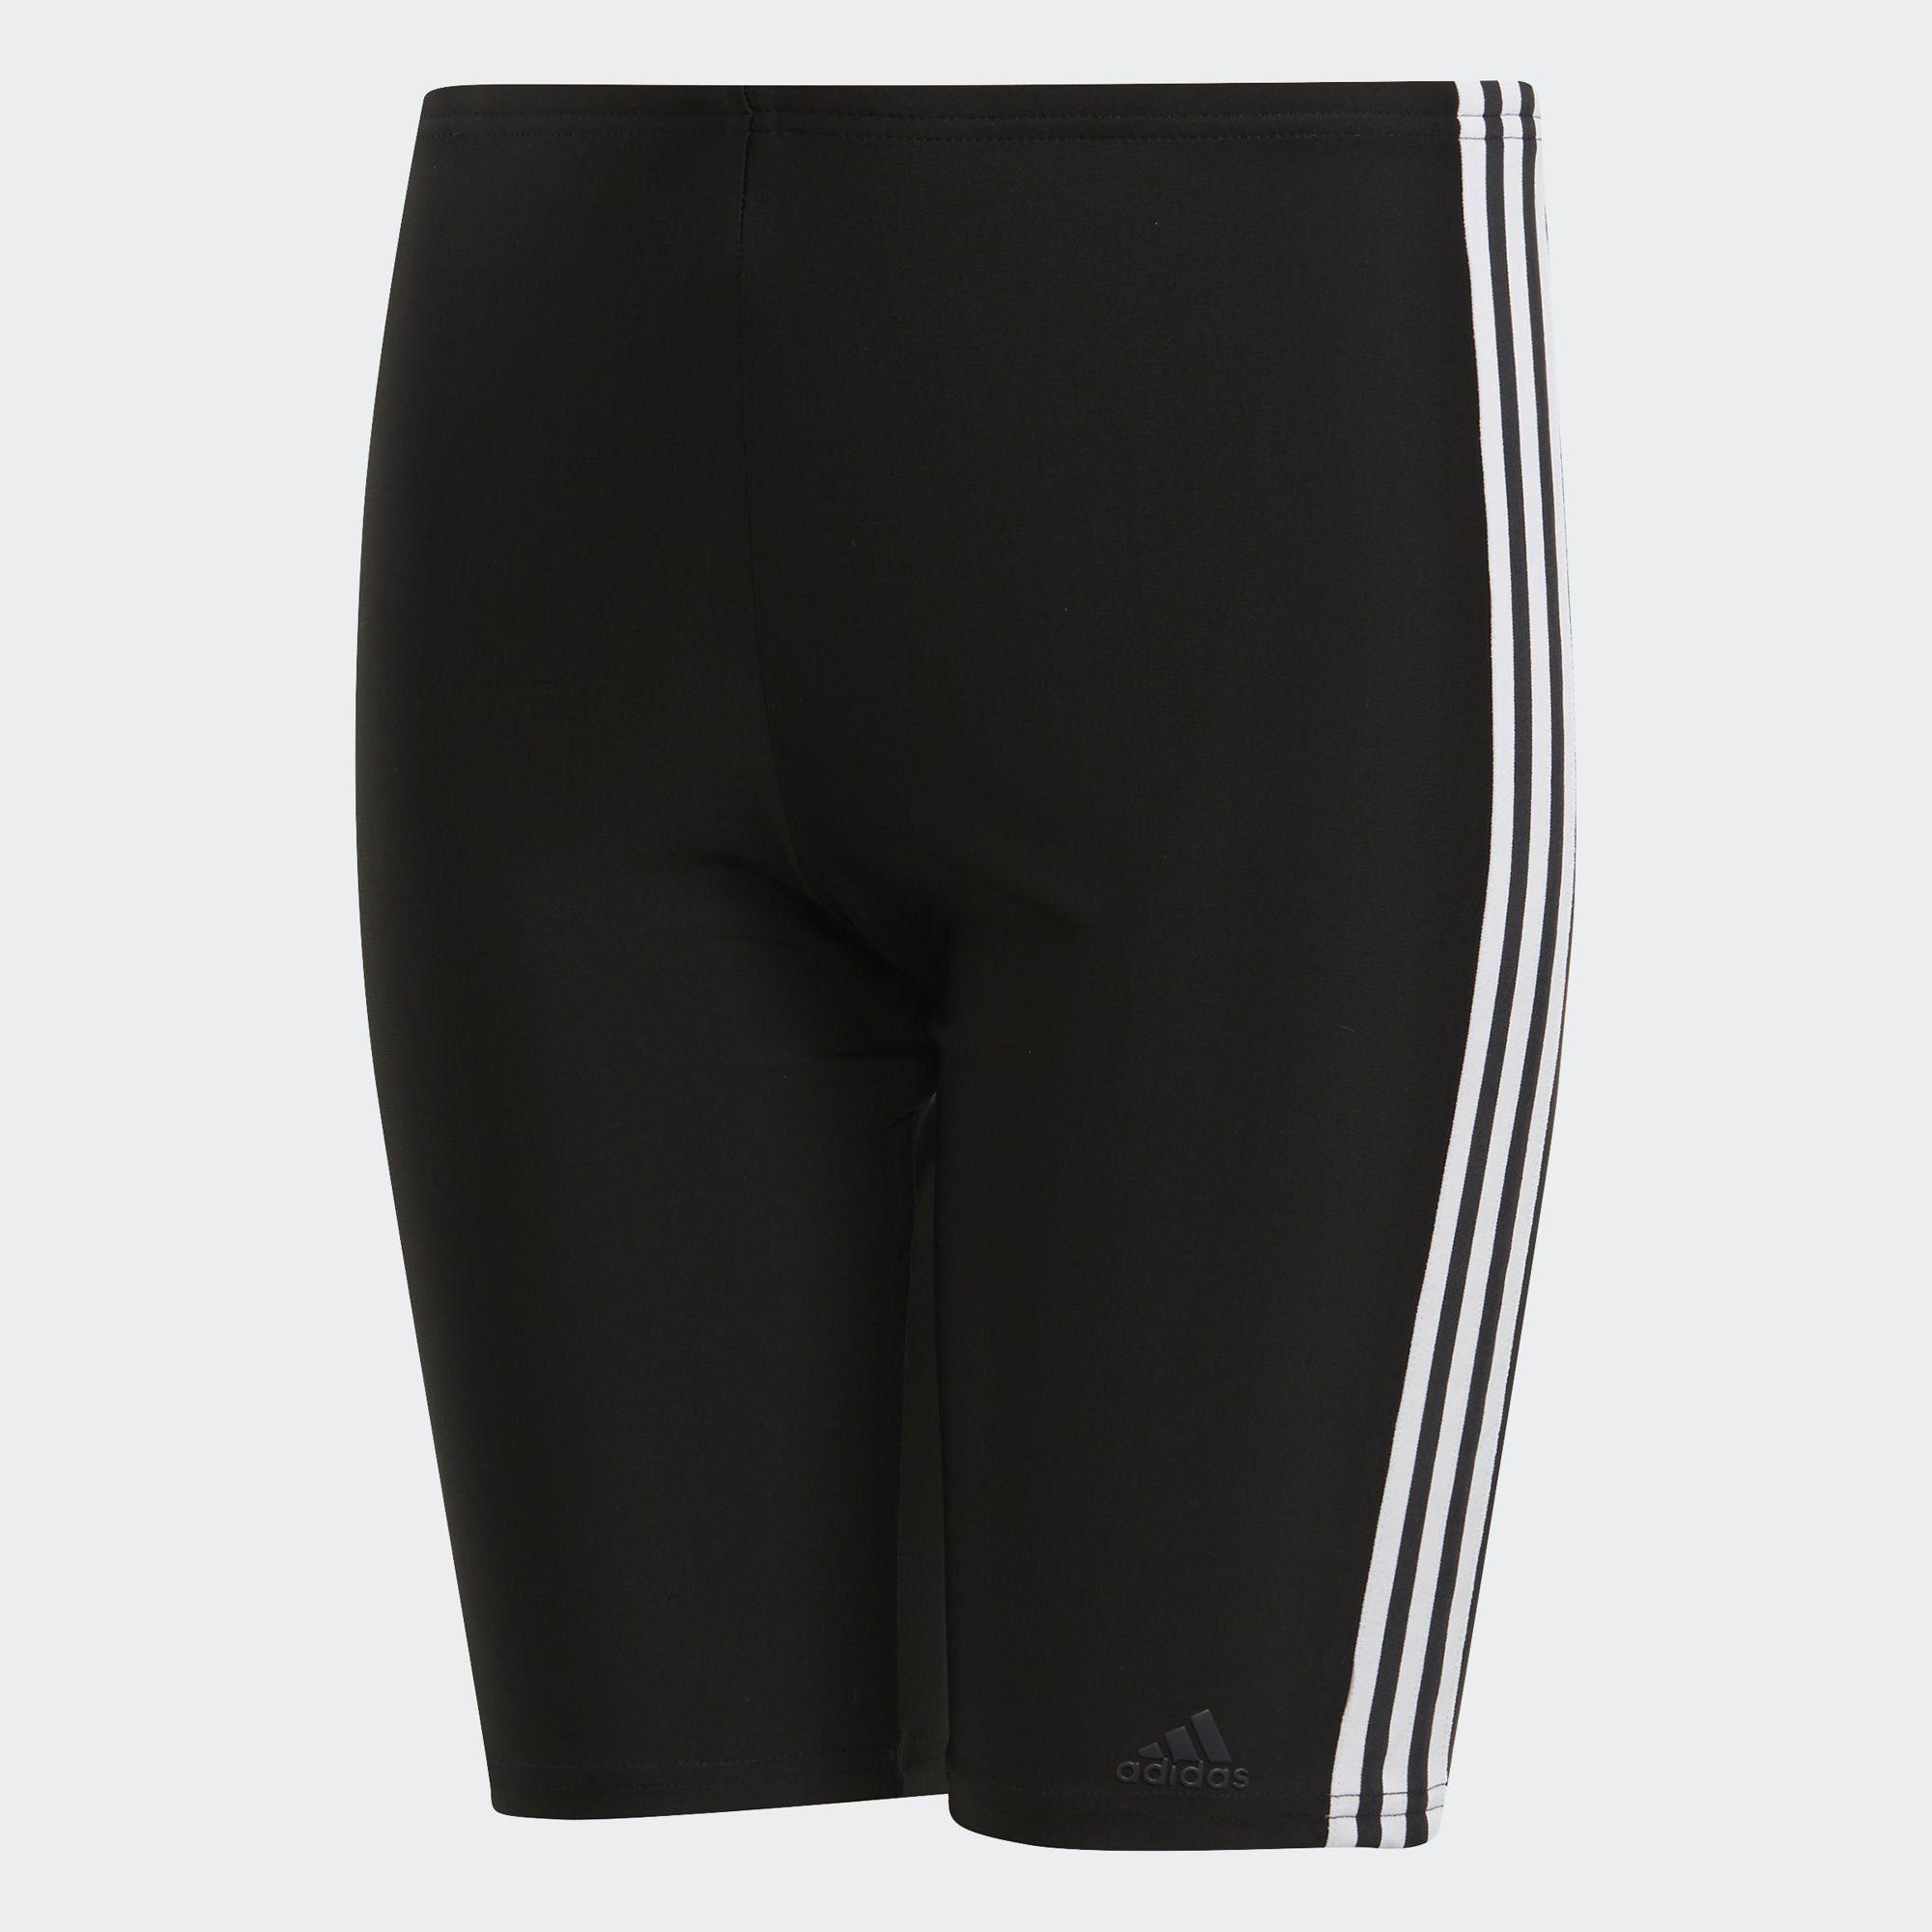 adidas Performance Badehose »3-Streifen Jammer-Badehose«, 3 Stripes